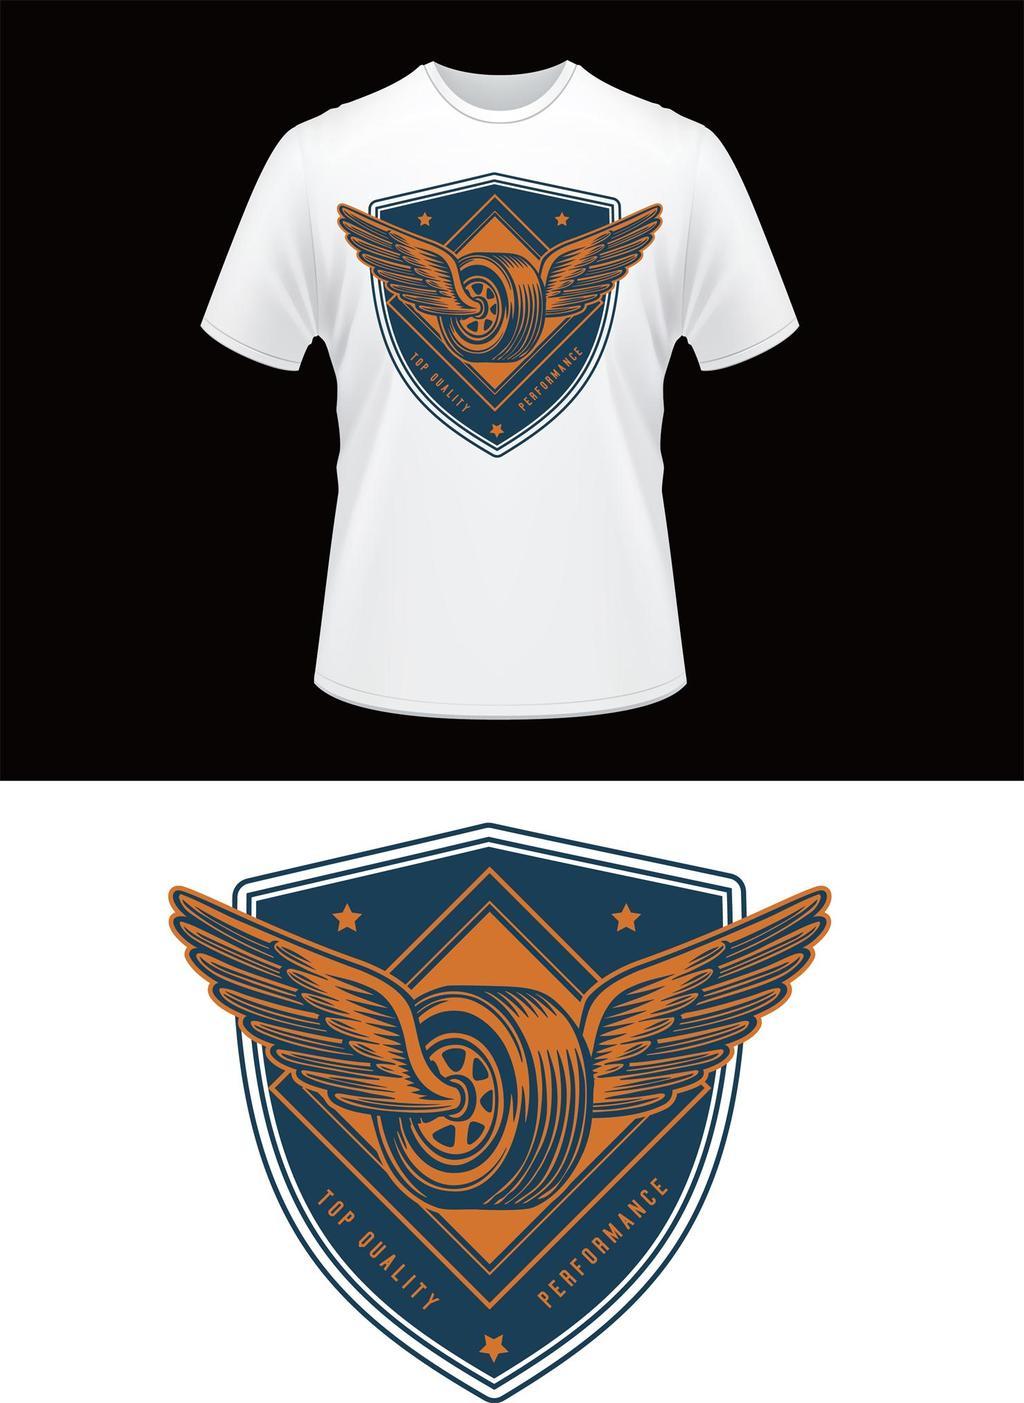 t恤设计图 短袖t恤 英文 手绘 肌理 趣味 涂鸦 盾牌图标 翅膀图案